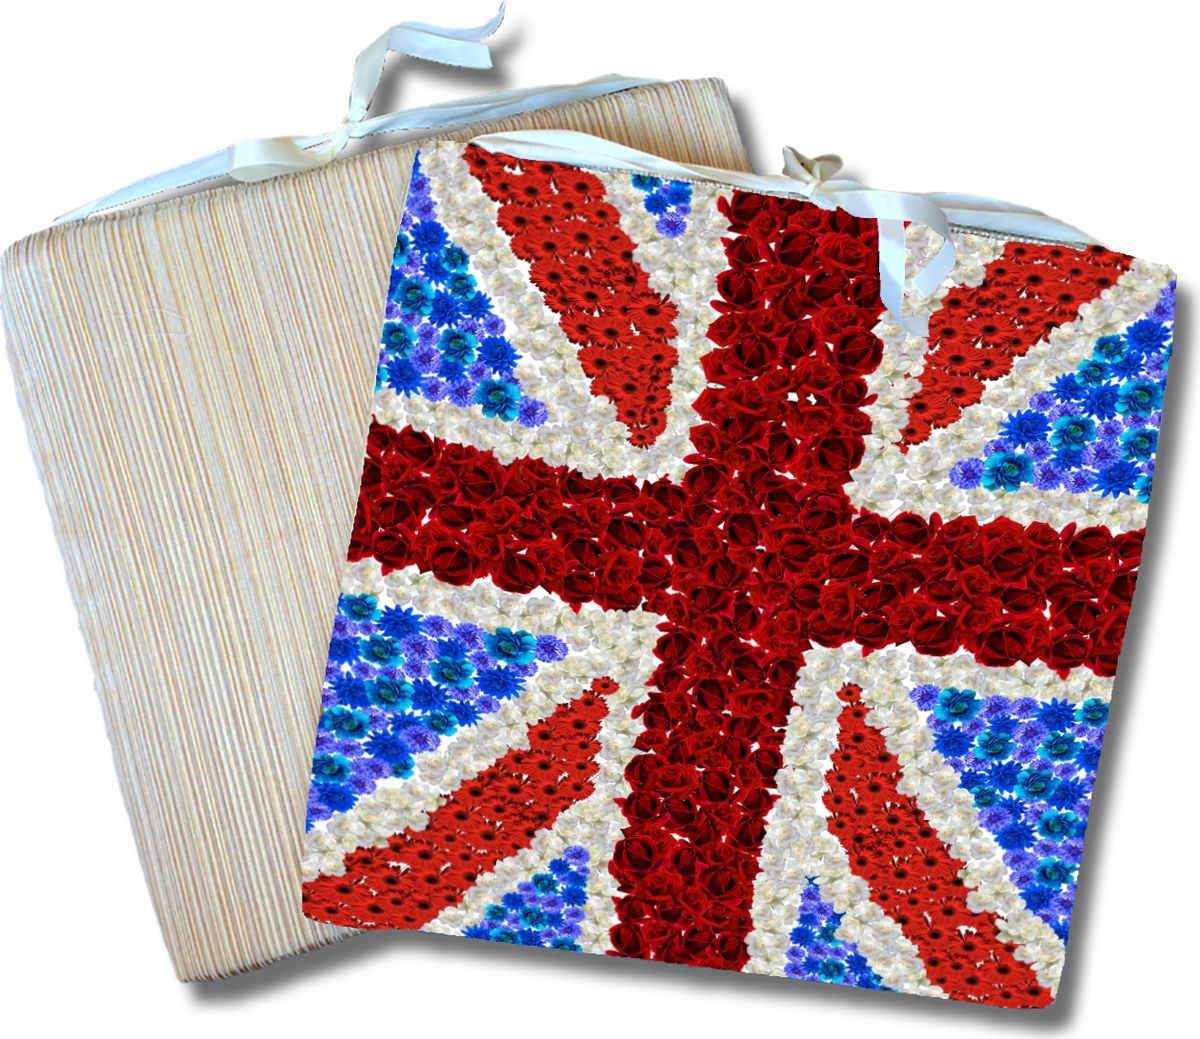 Подушка на стул GiftnHome Британский флаг, 40 х 40 х 2 смSEAT-40 БритФлагСидушка декоративная Винтажный Париж, материал: атлас, наполнитель поролон